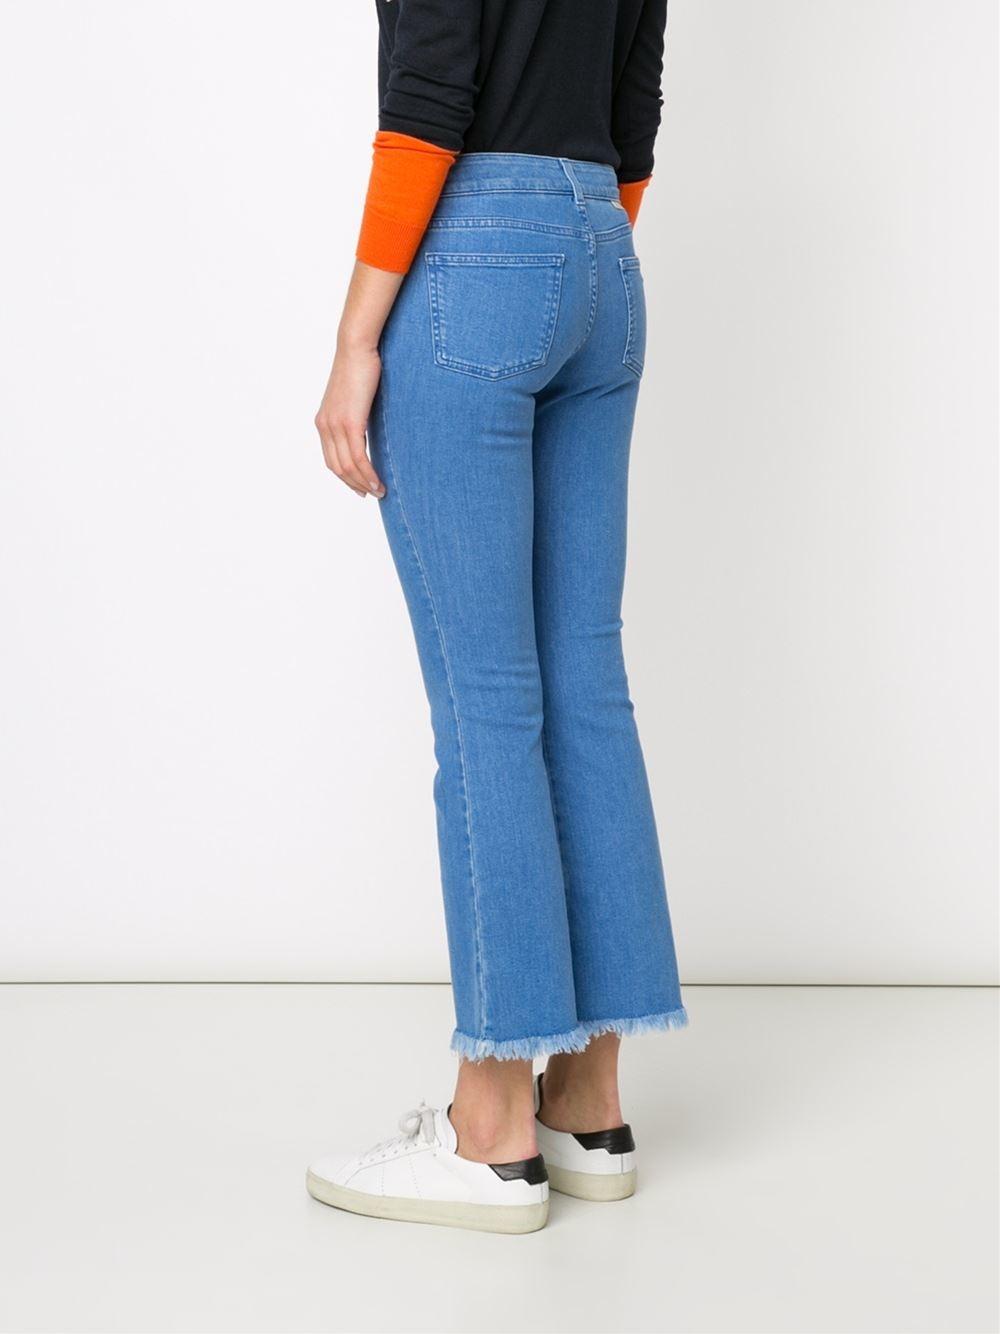 flared cropped trousers - Blue Stella McCartney Geniue Stockist Online RQSFWAl322